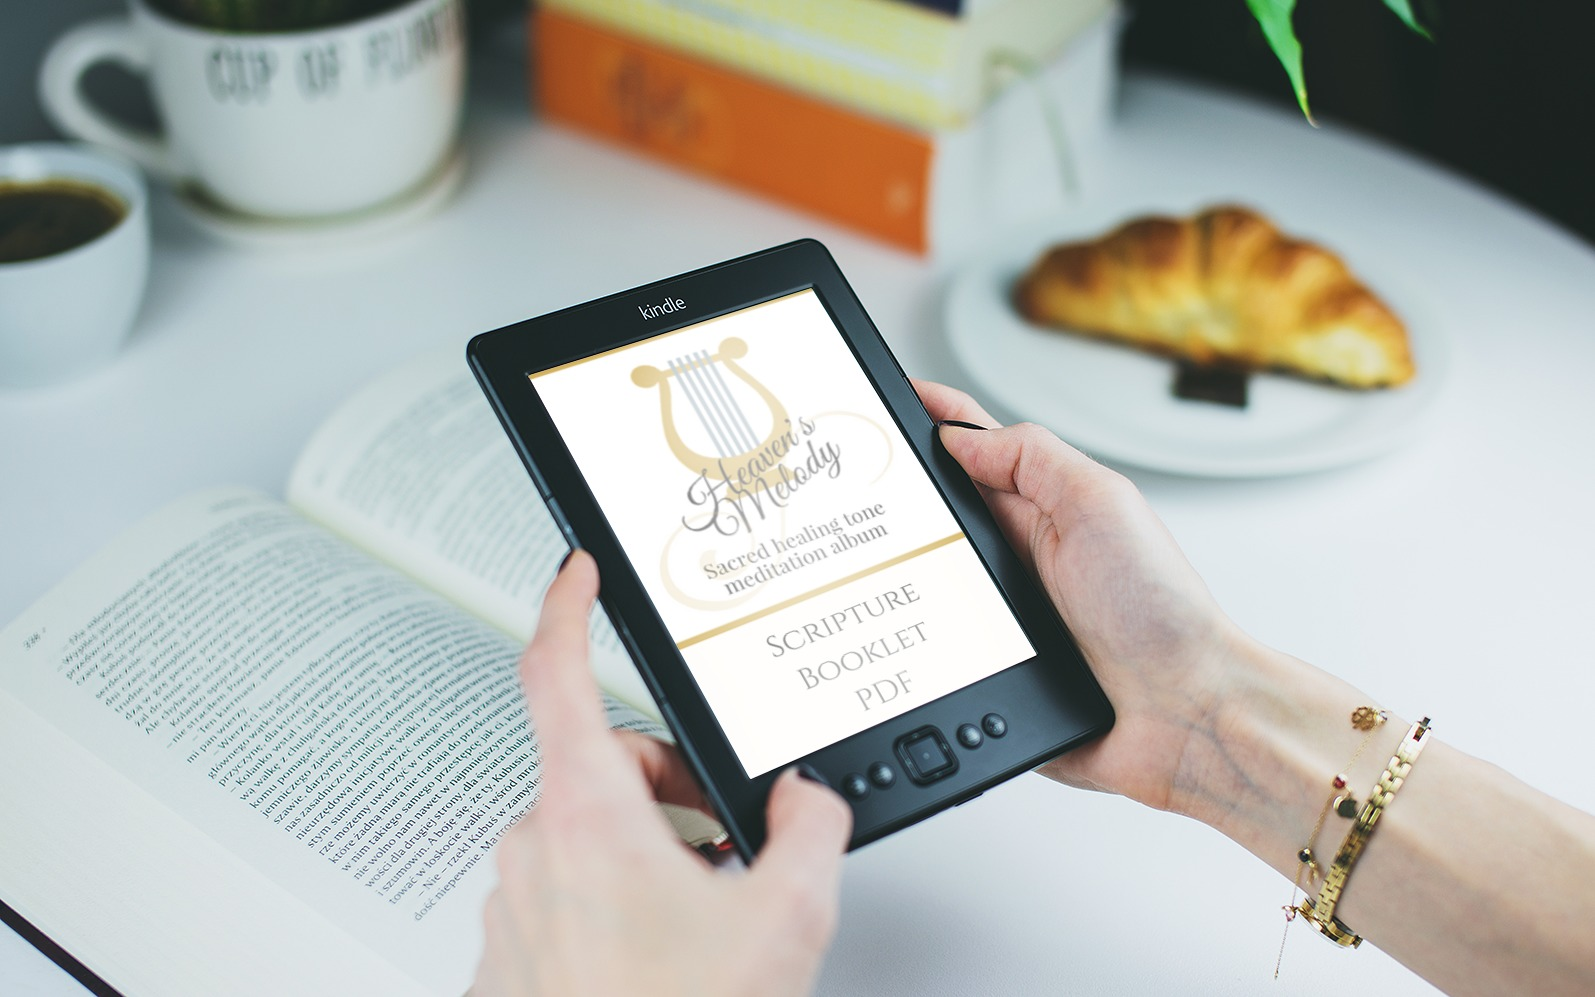 scripture booklet on tablet.jpg